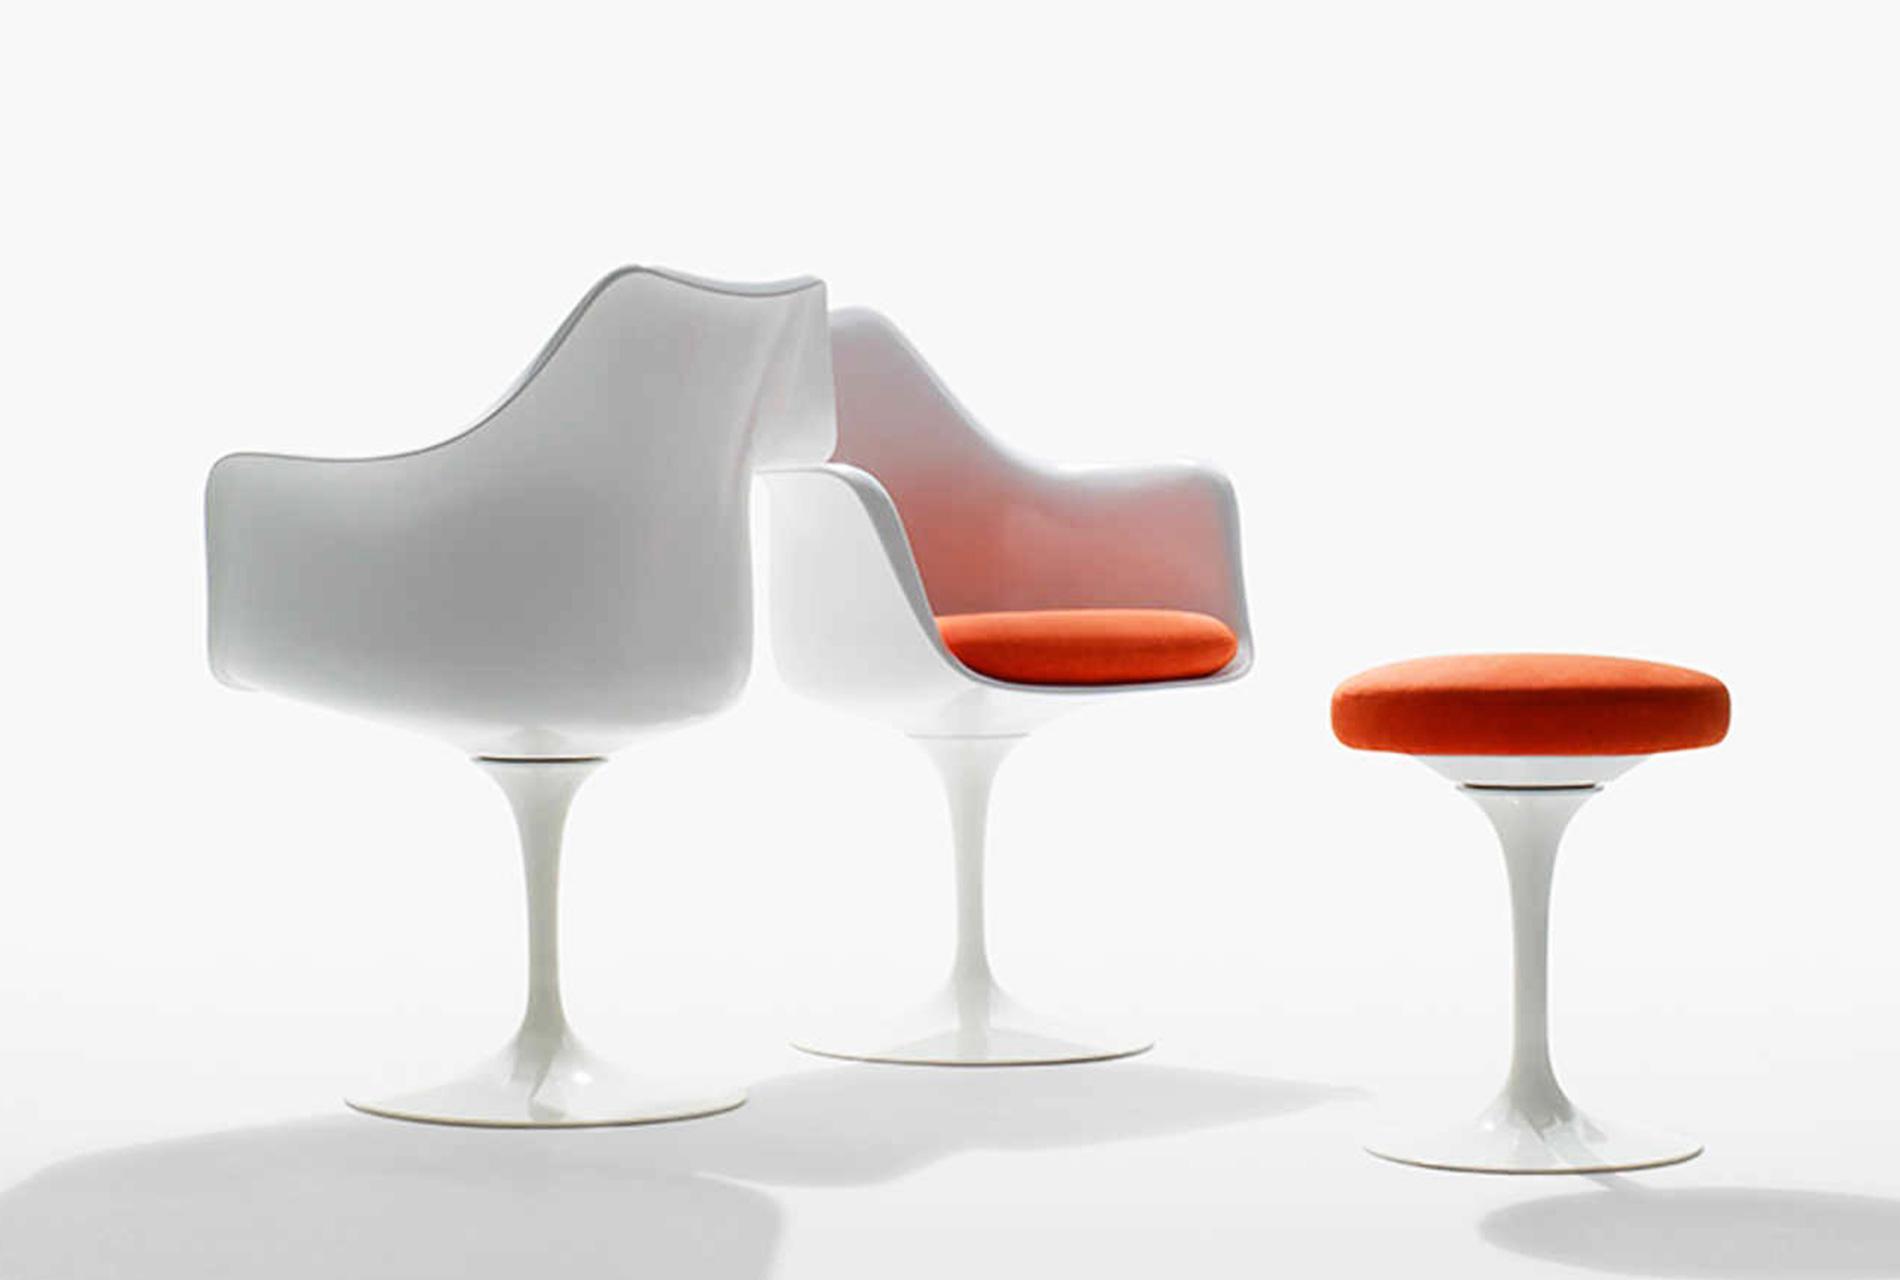 Eero Saarinen timeless perfection